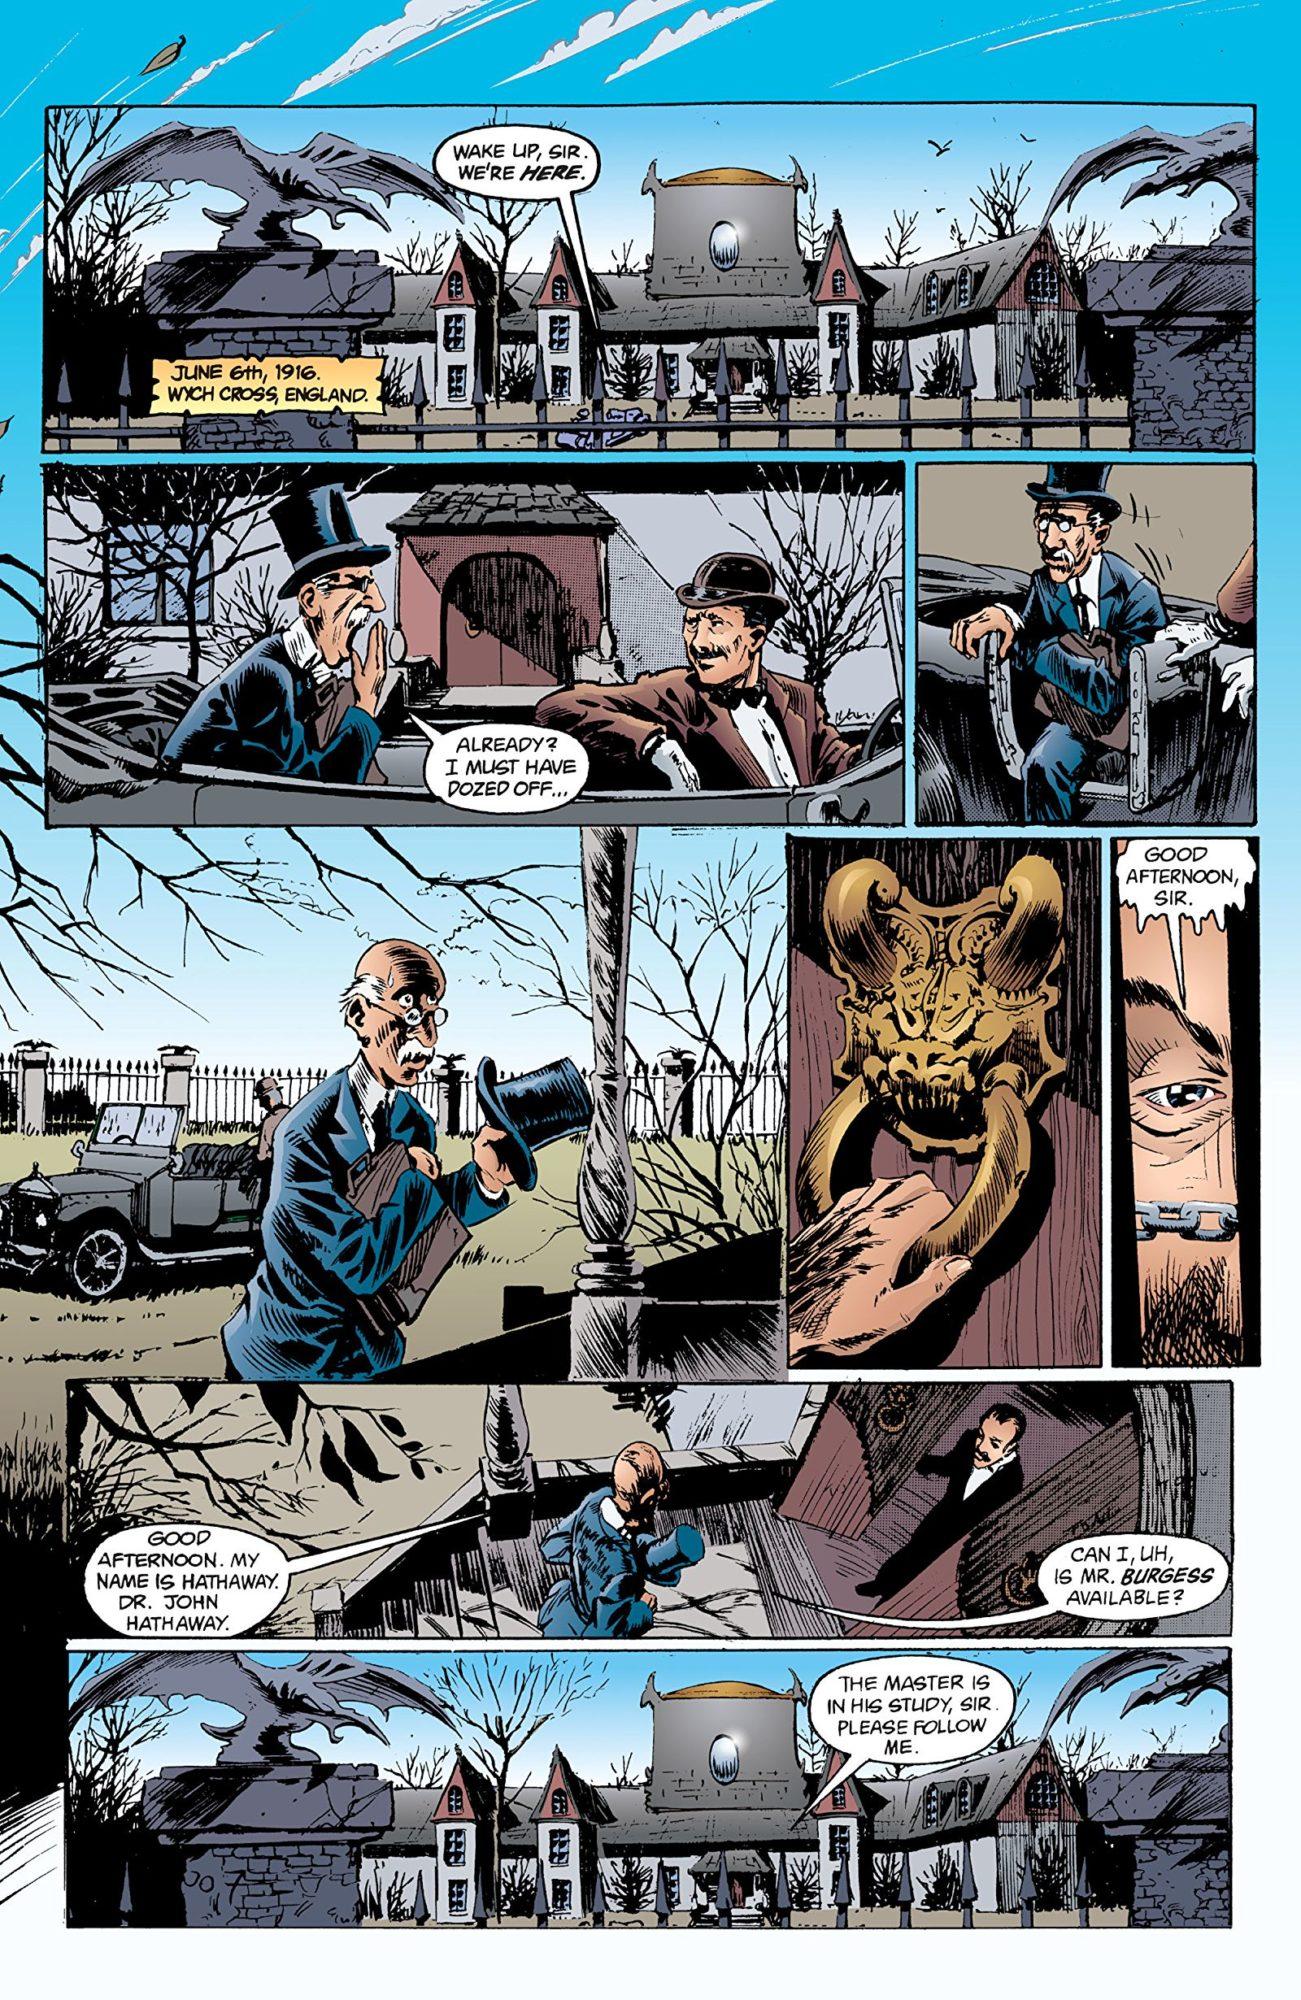 Review of Neil Gaiman's The Sandman Preludes & Nocturnes 2